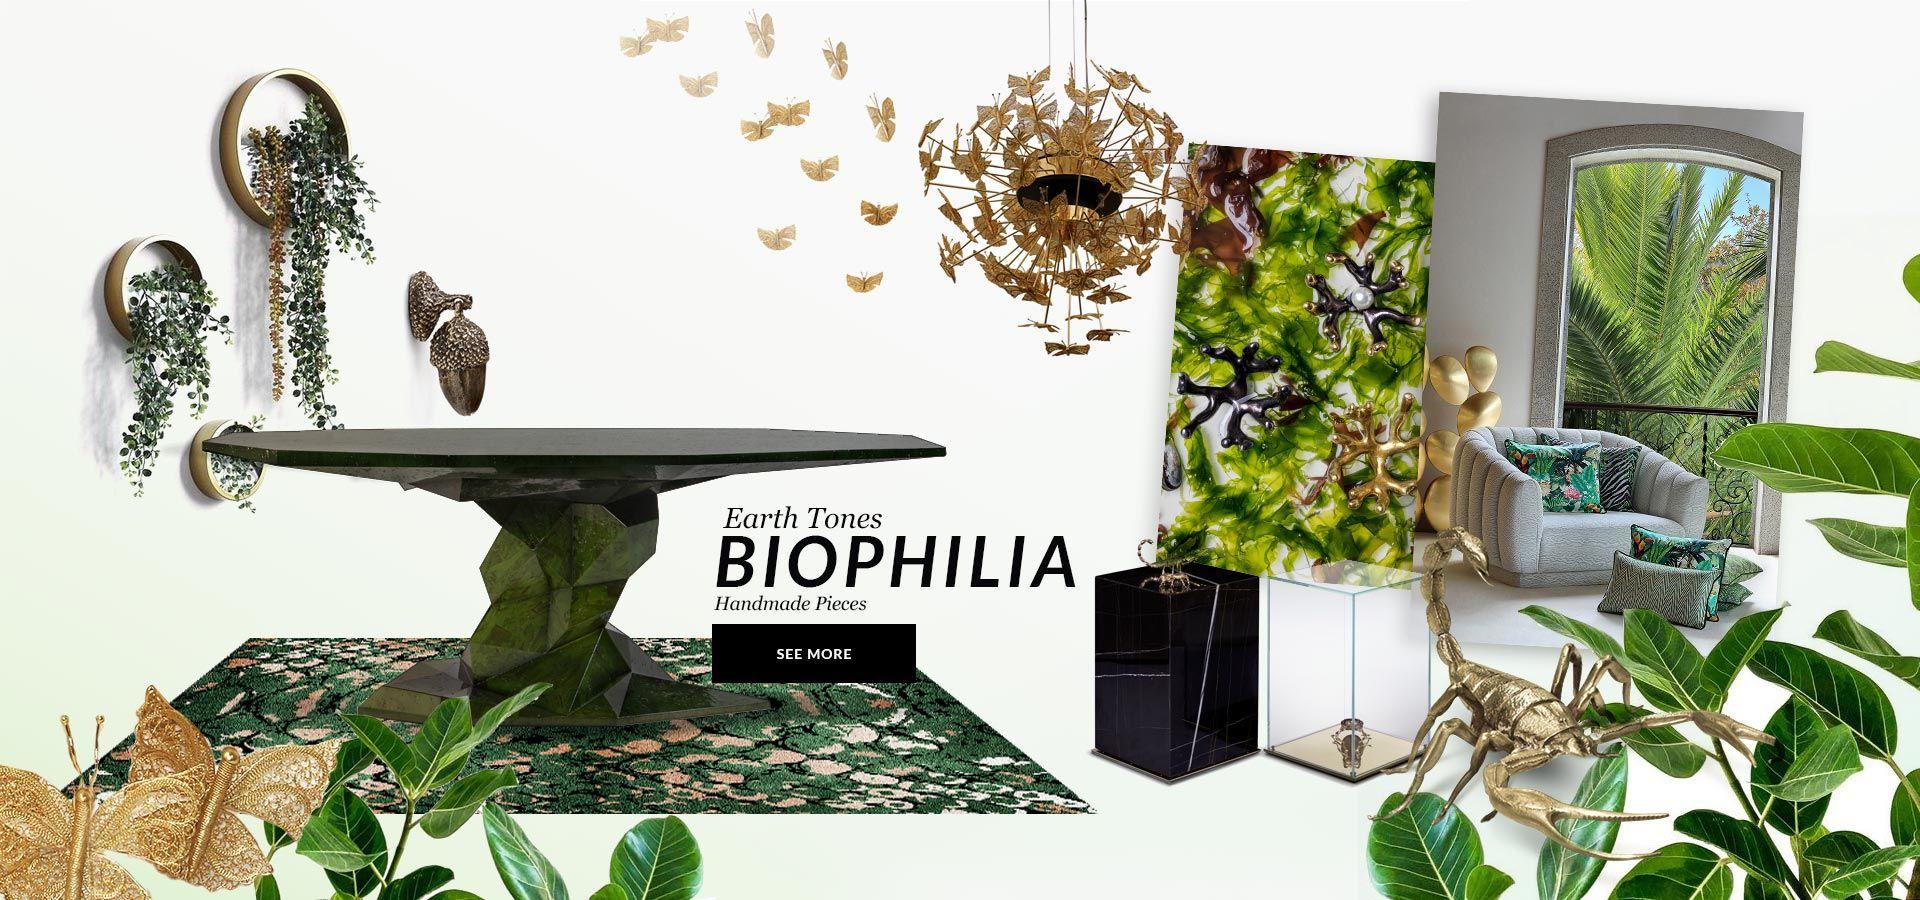 earth-tones-biophilia-moodboard-01.jpg